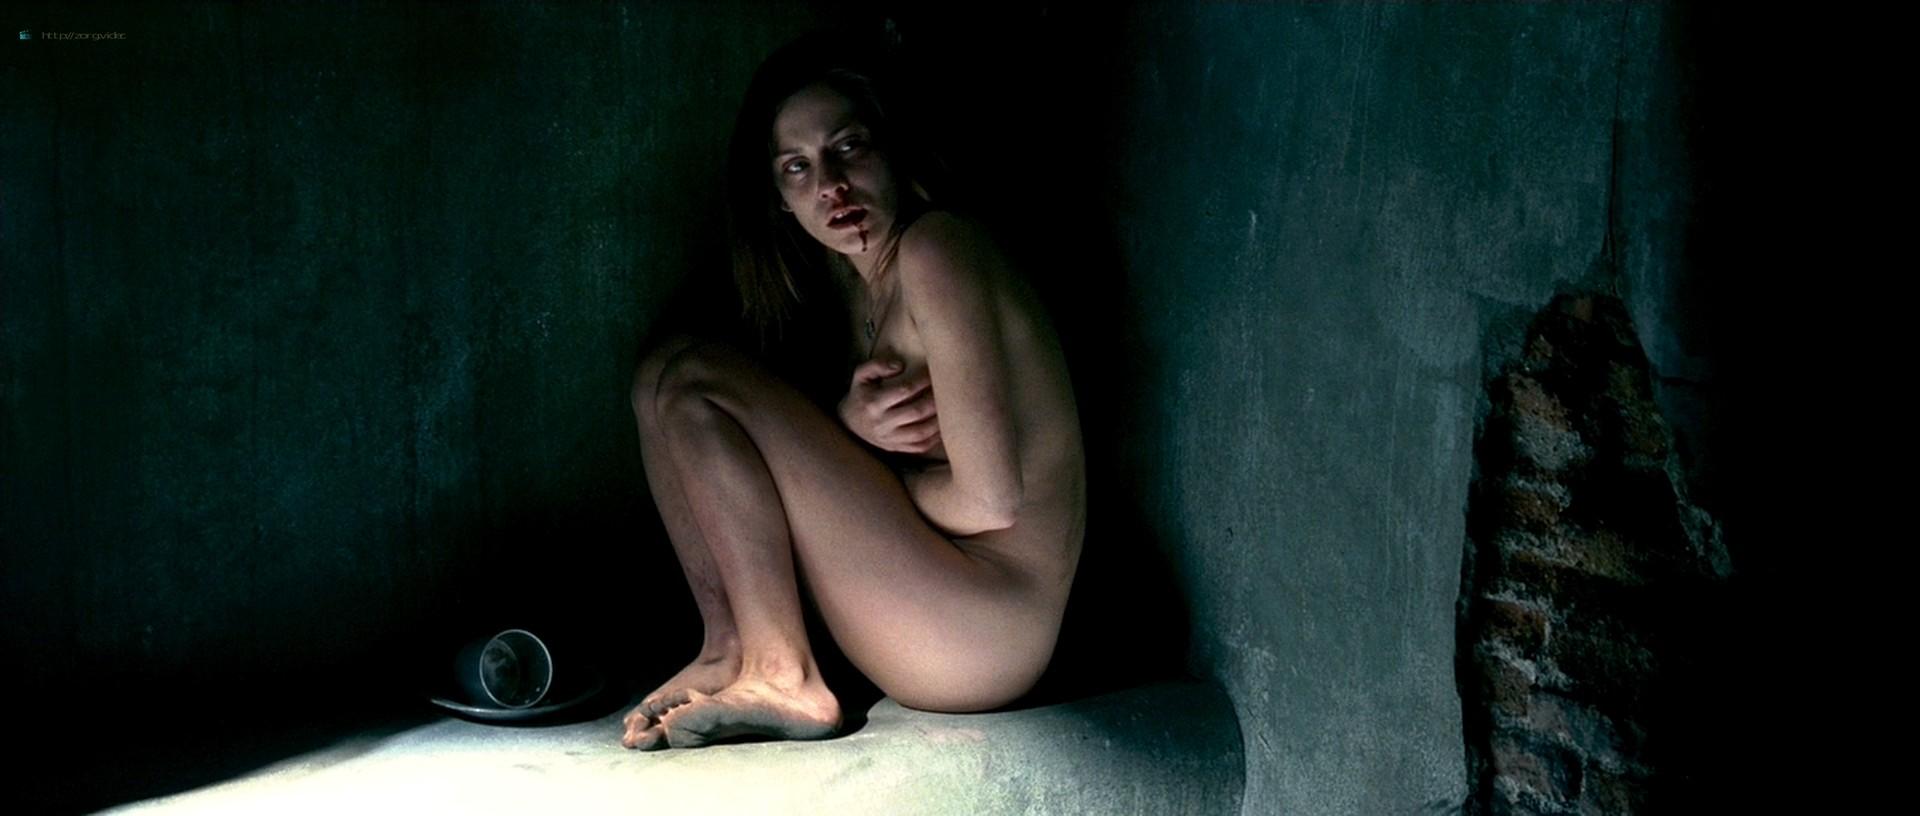 Maria Leon nude in - La voz dormida (2011) HD 1080p BluRay (6)